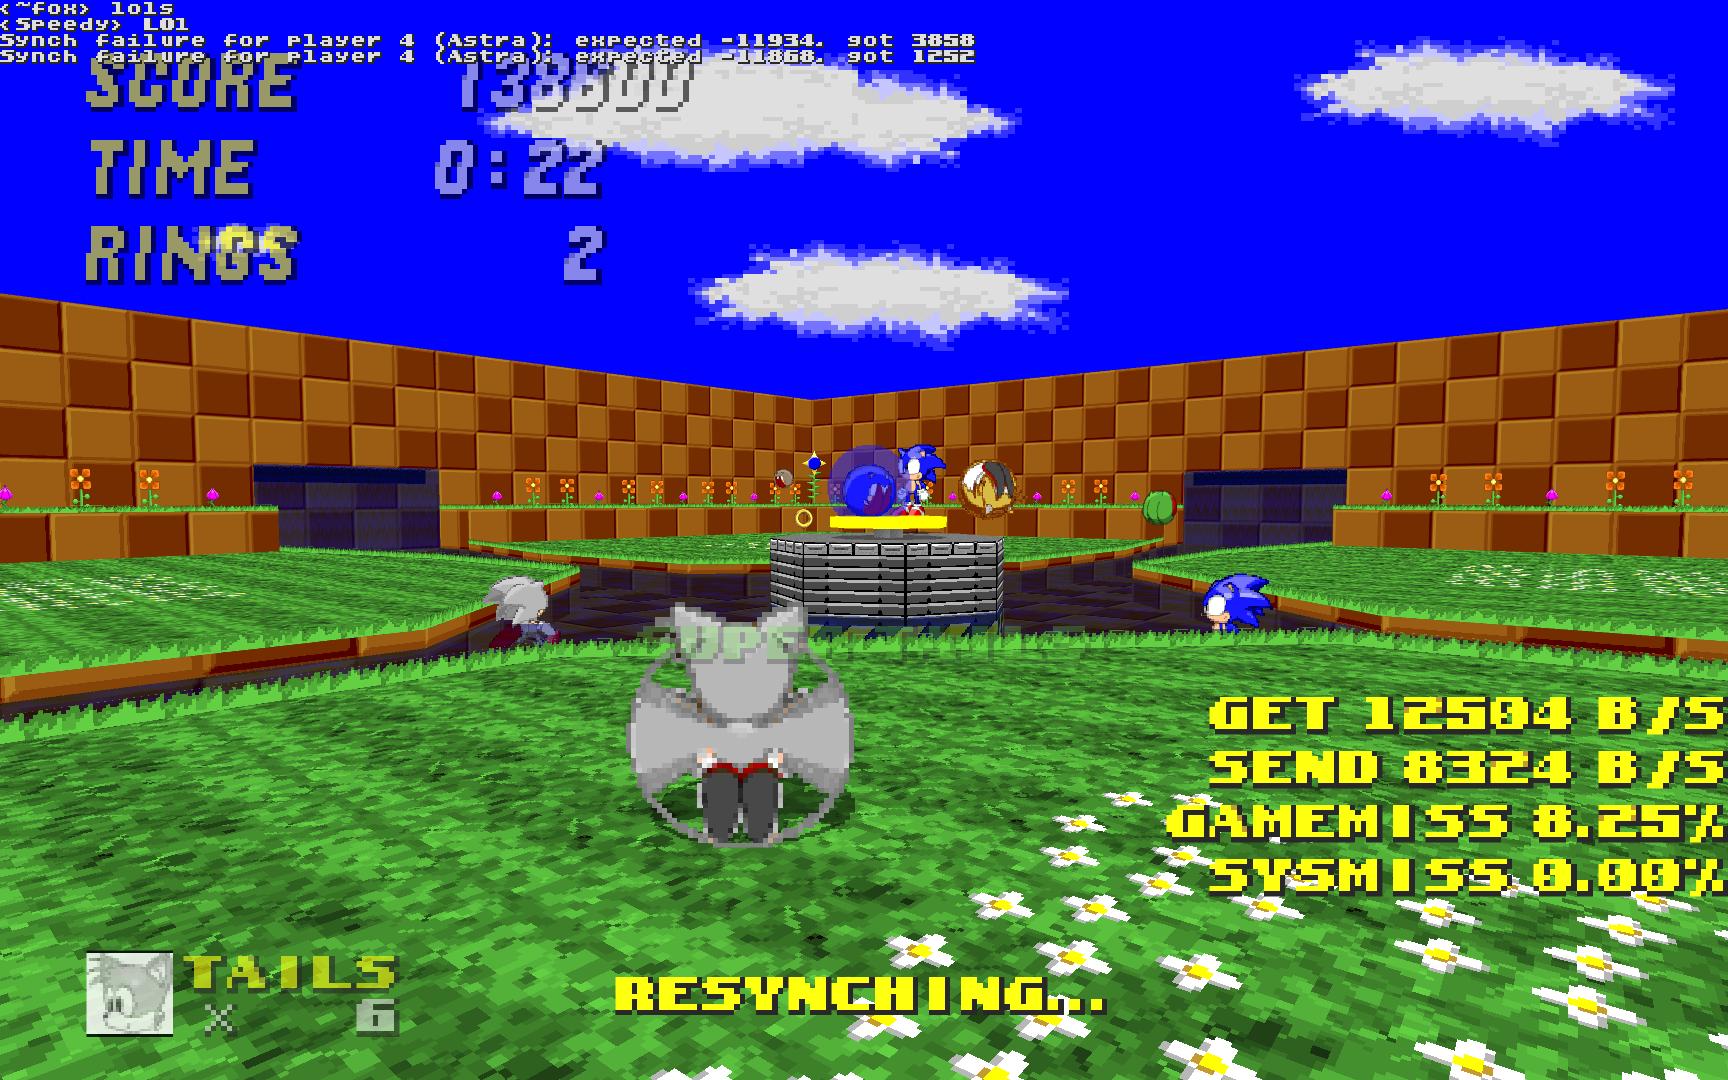 Sonic robo blast 2 play game casinos in geneva